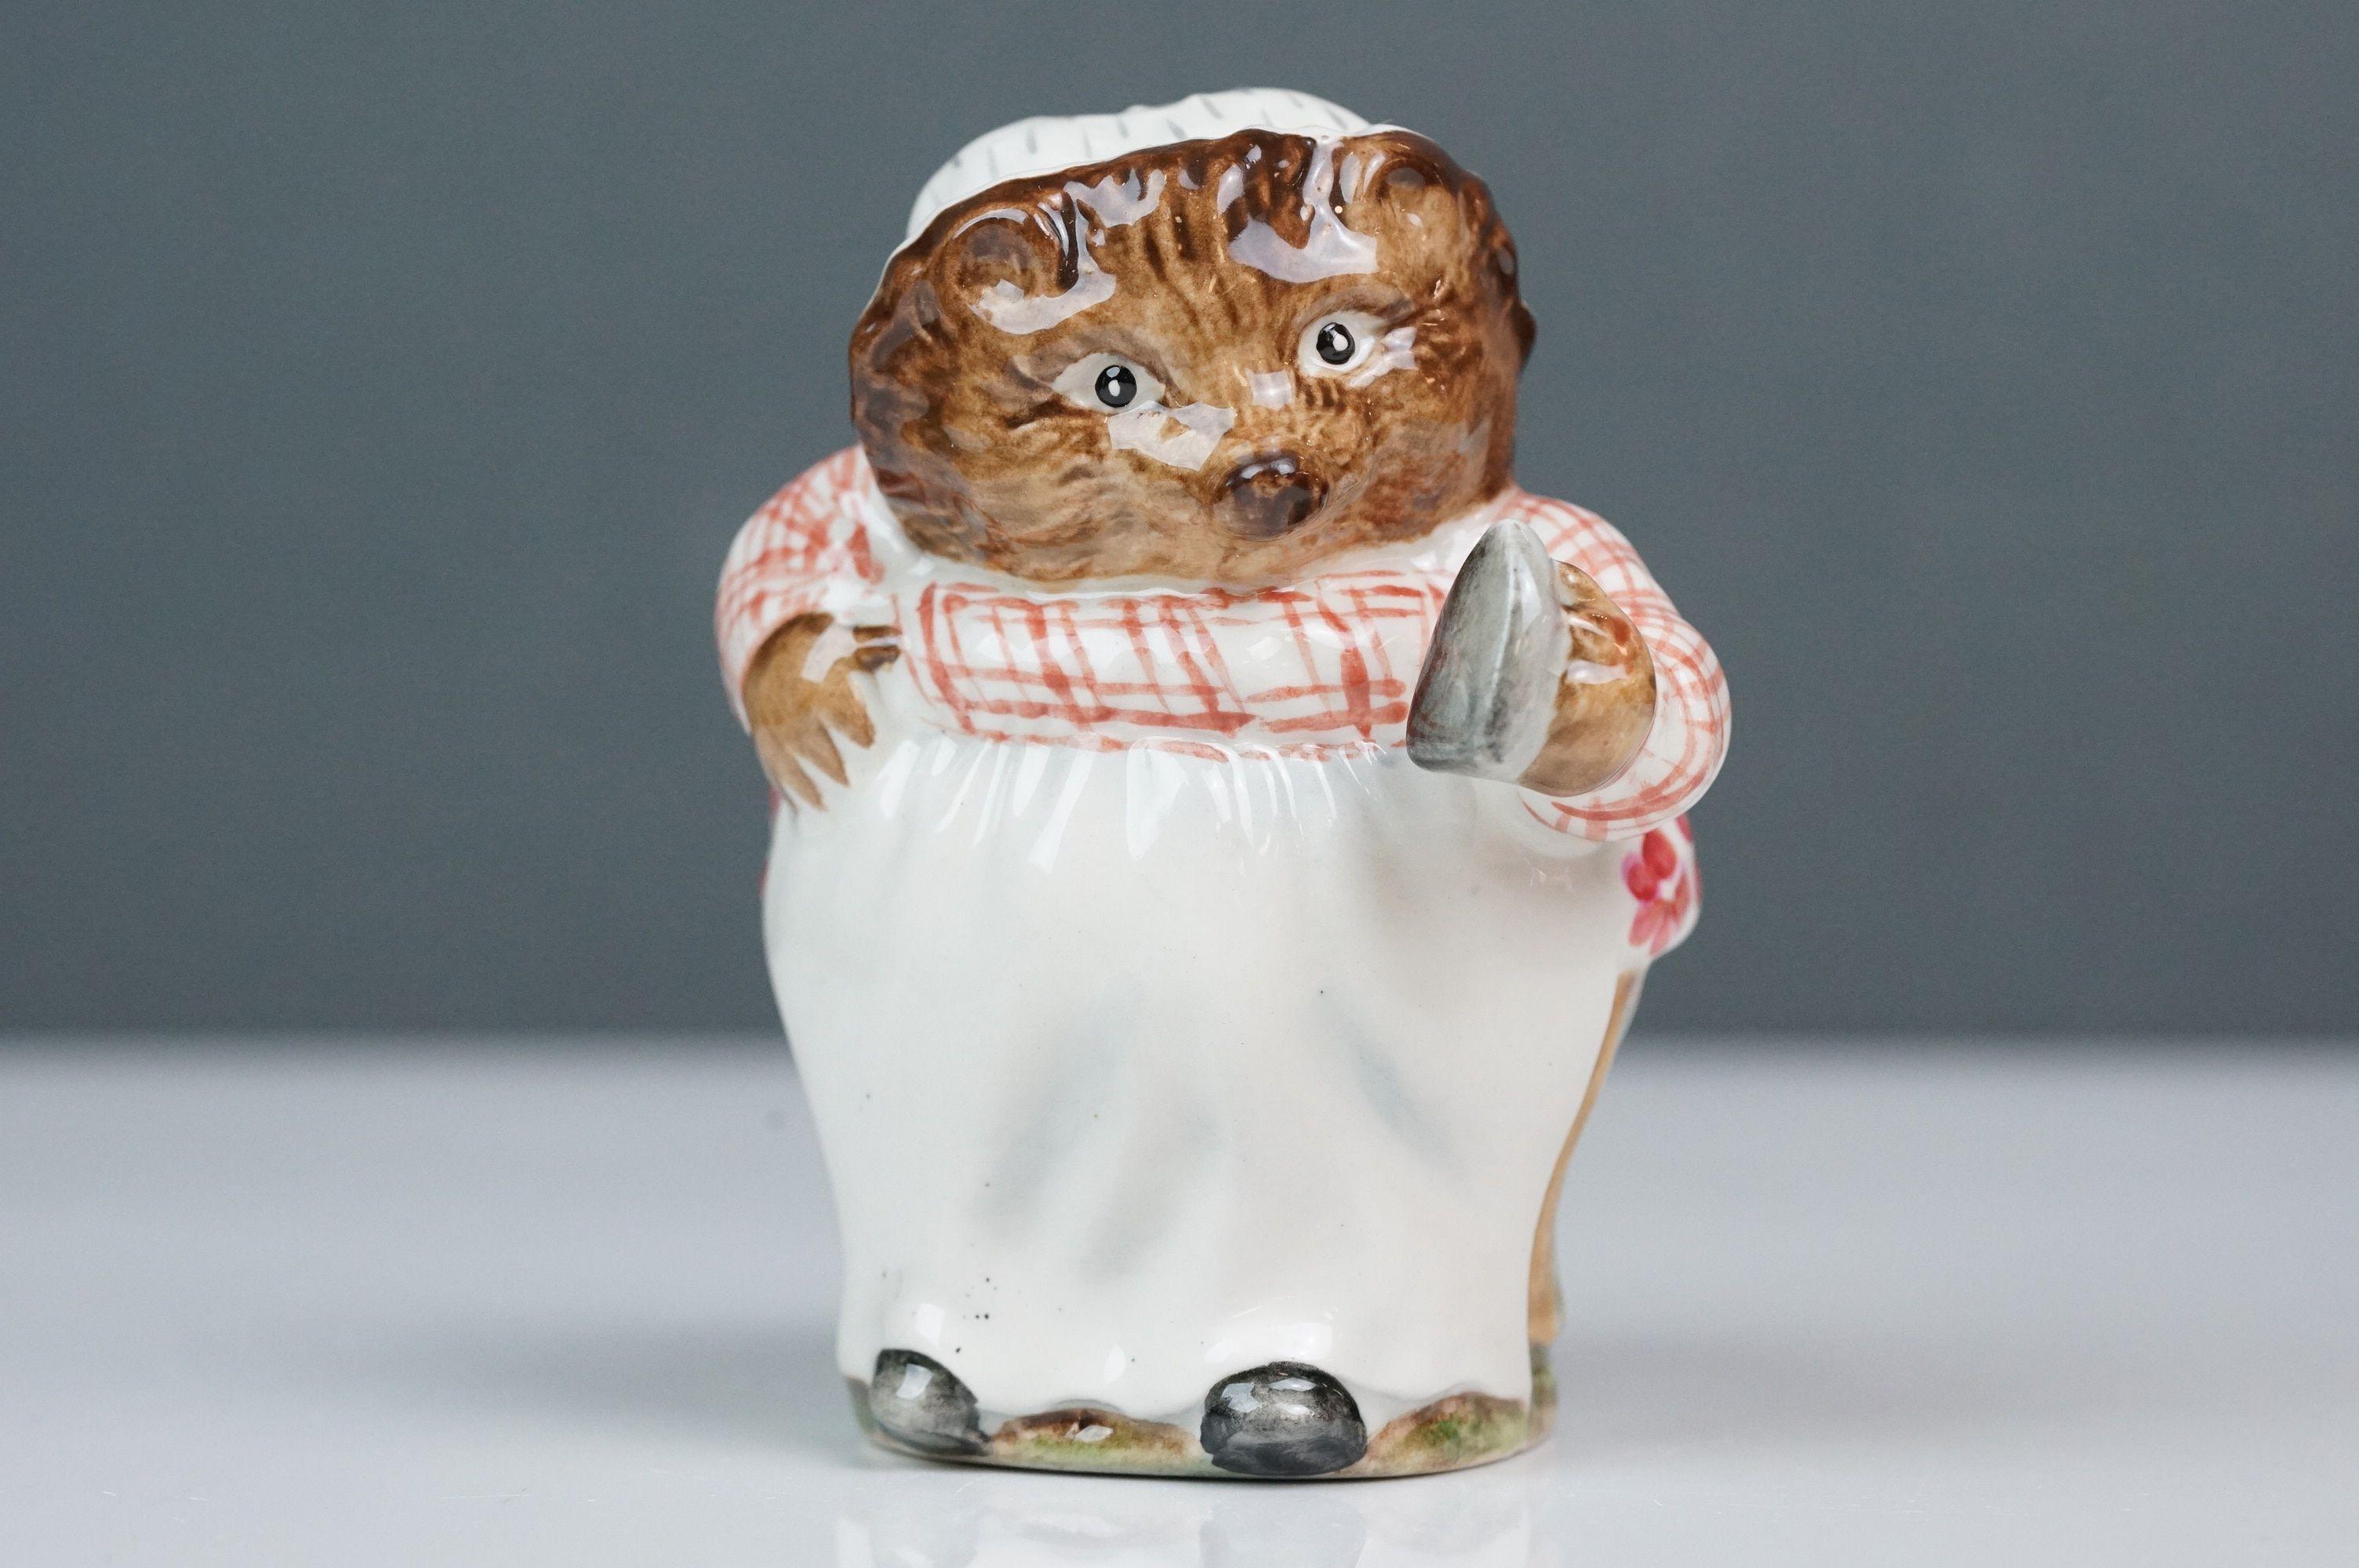 Beswick Beatrix Potter's Mrs Tiggy-Winkle, first version, first variation, gloss finish, BP 1B No.